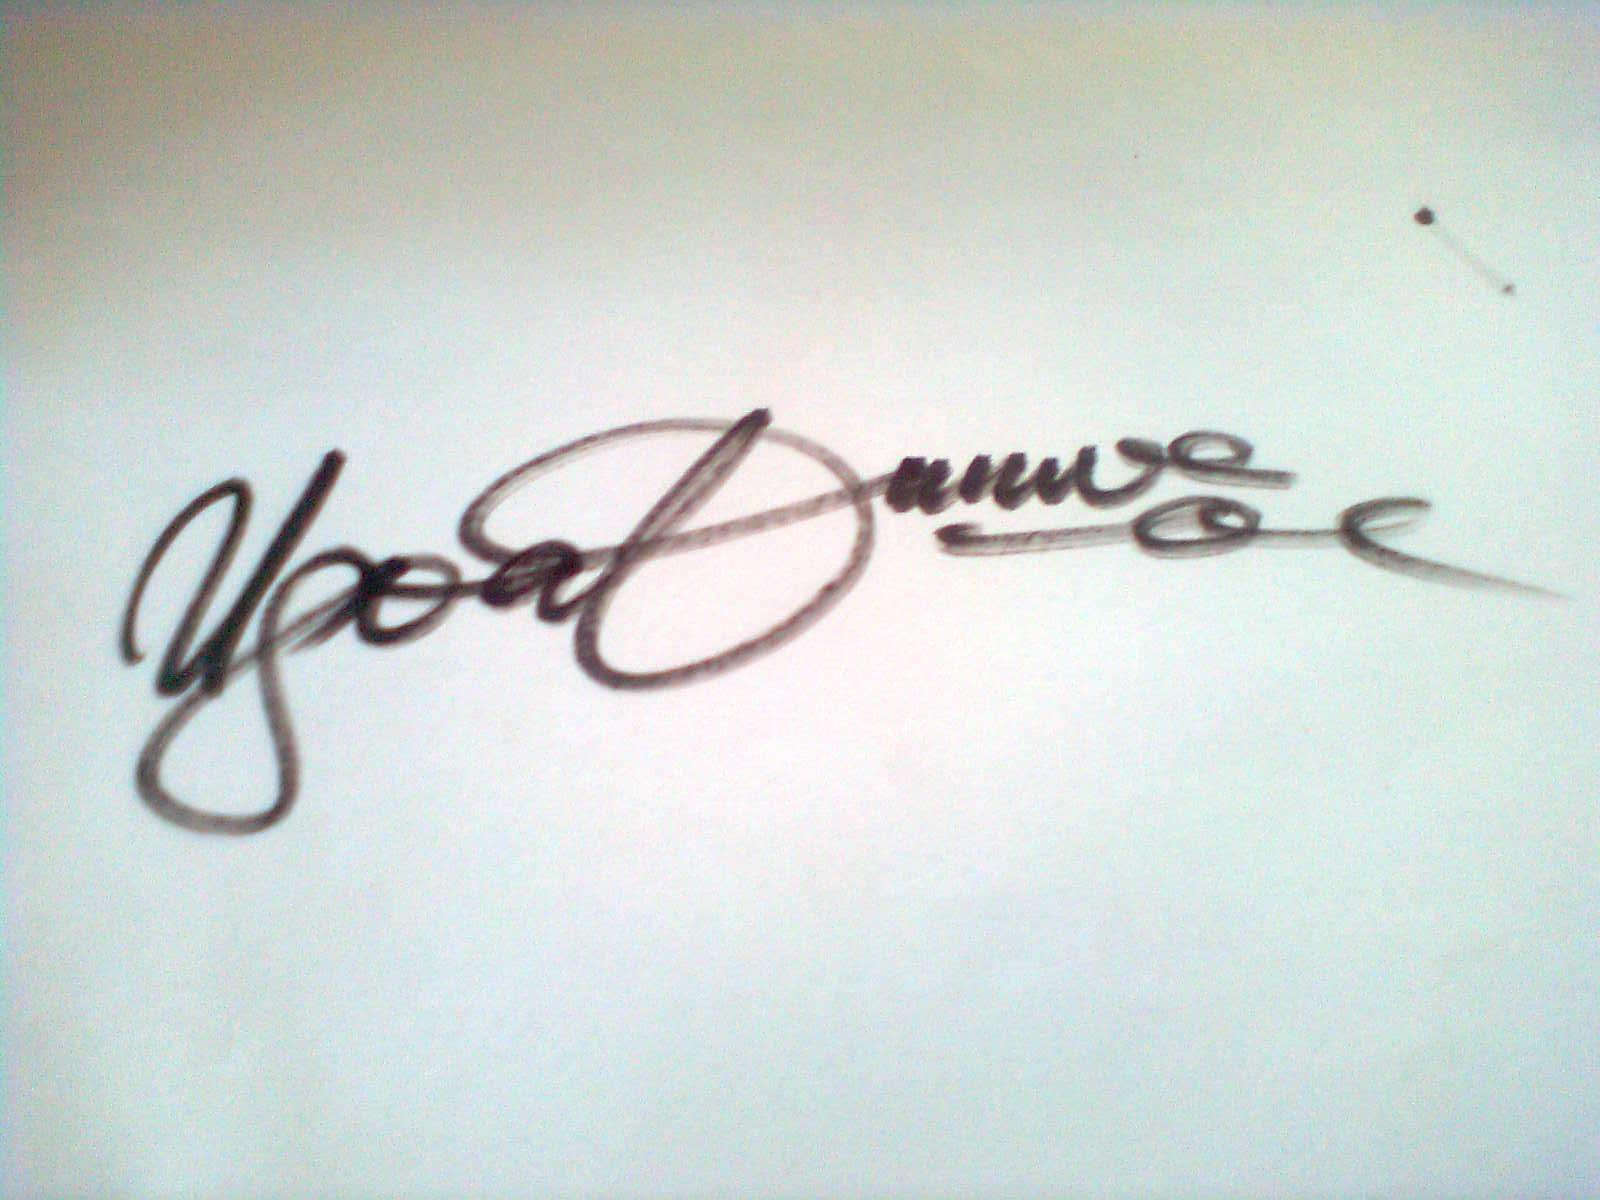 Cletus Ugoabunwa's Signature